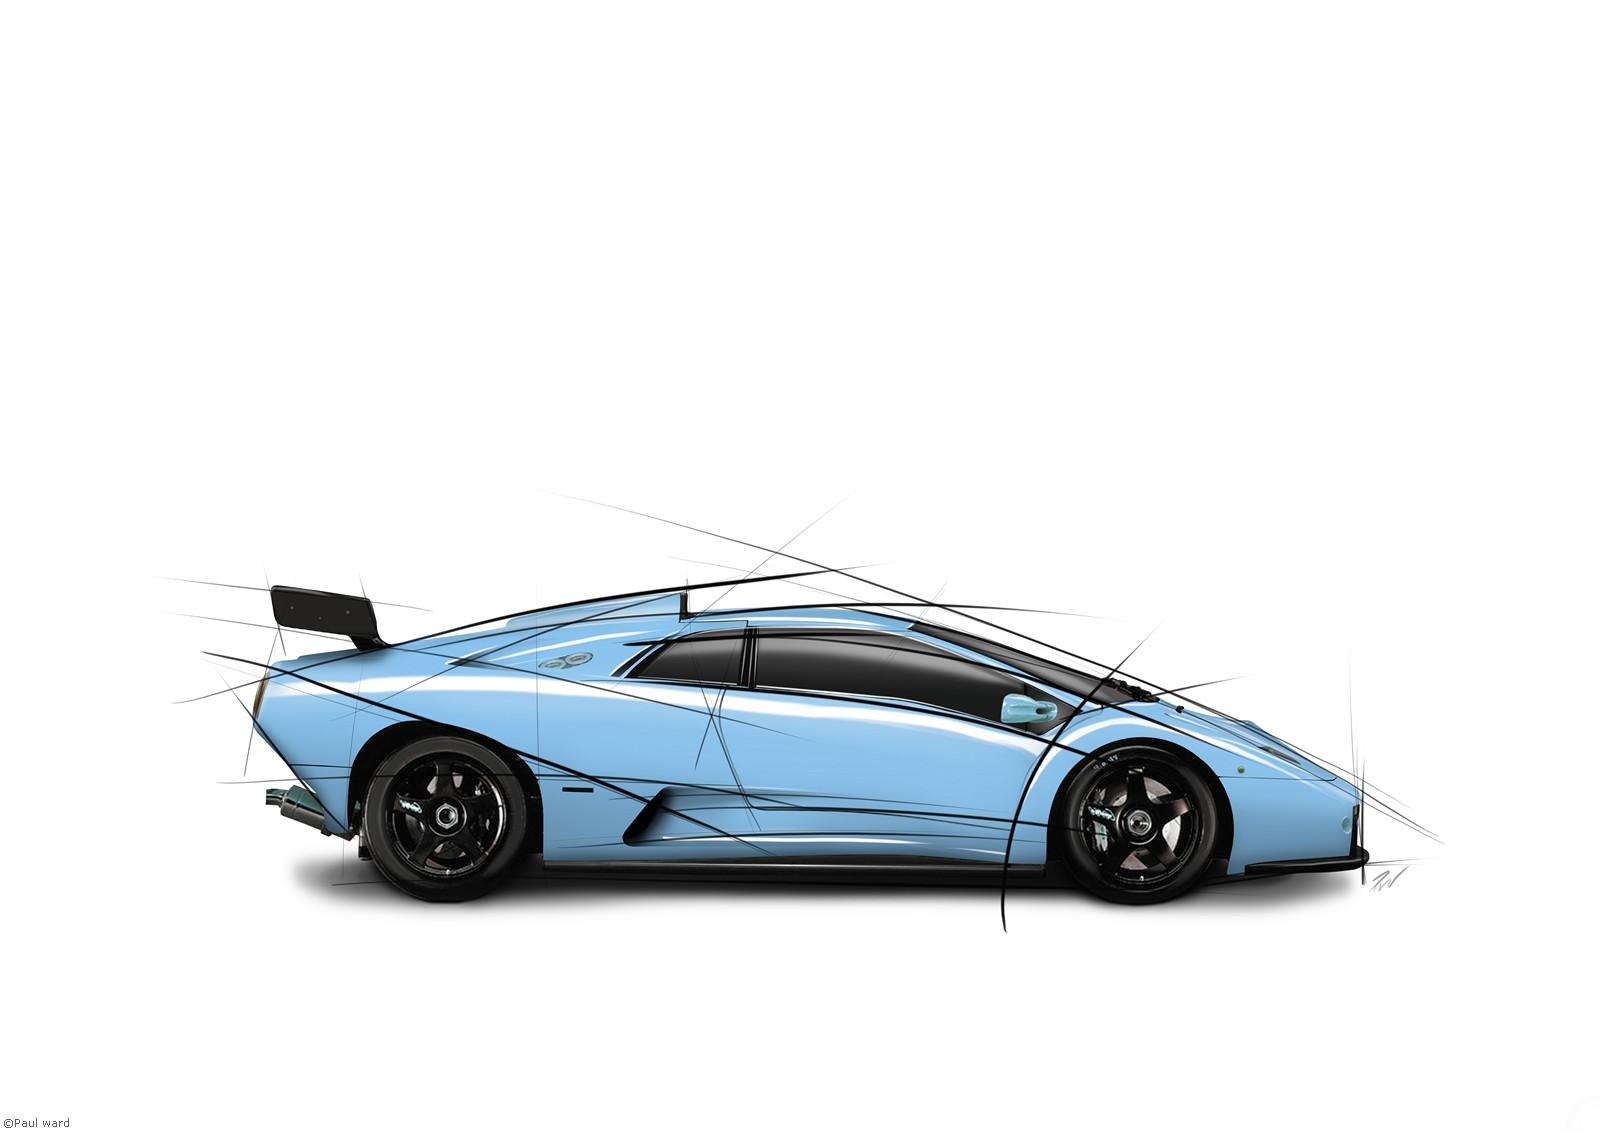 Lamborghini Diablo GT-R car graphic art image by classic car photographer Paul Ward